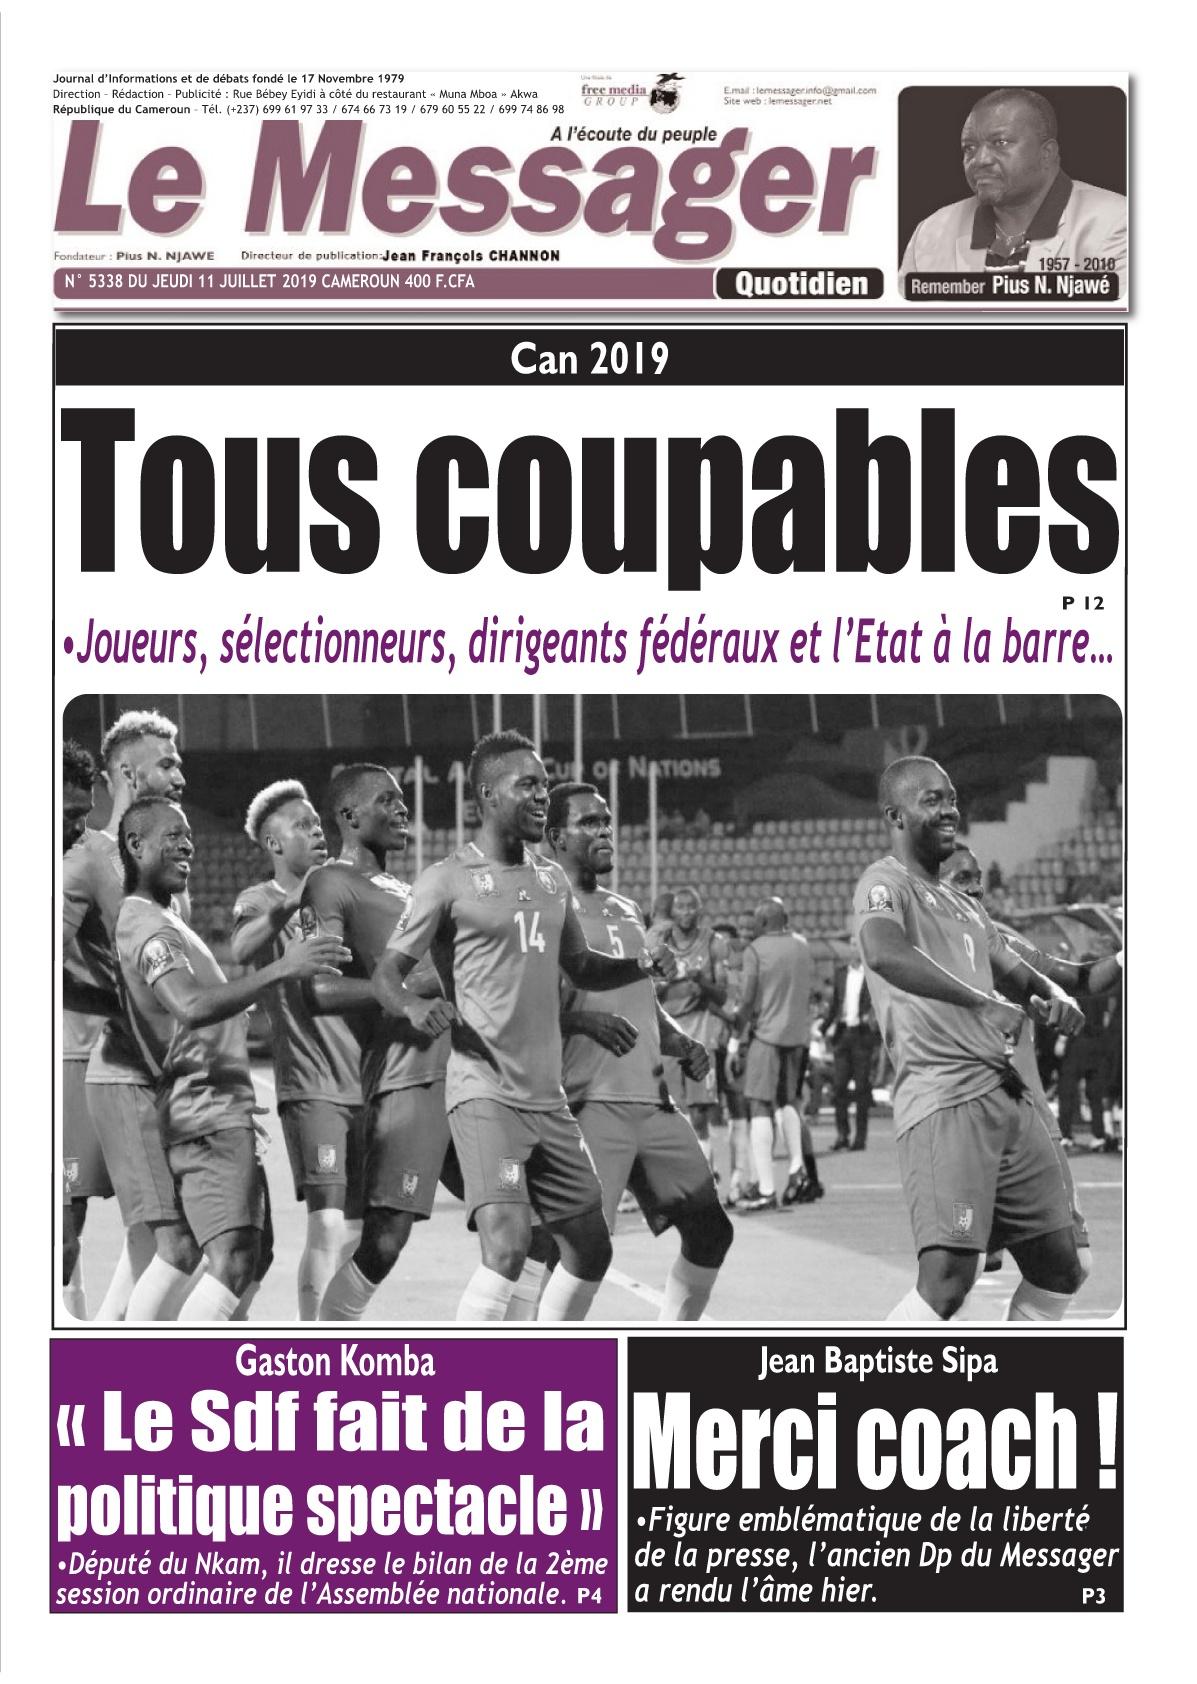 Le Messager - 11/07/2019